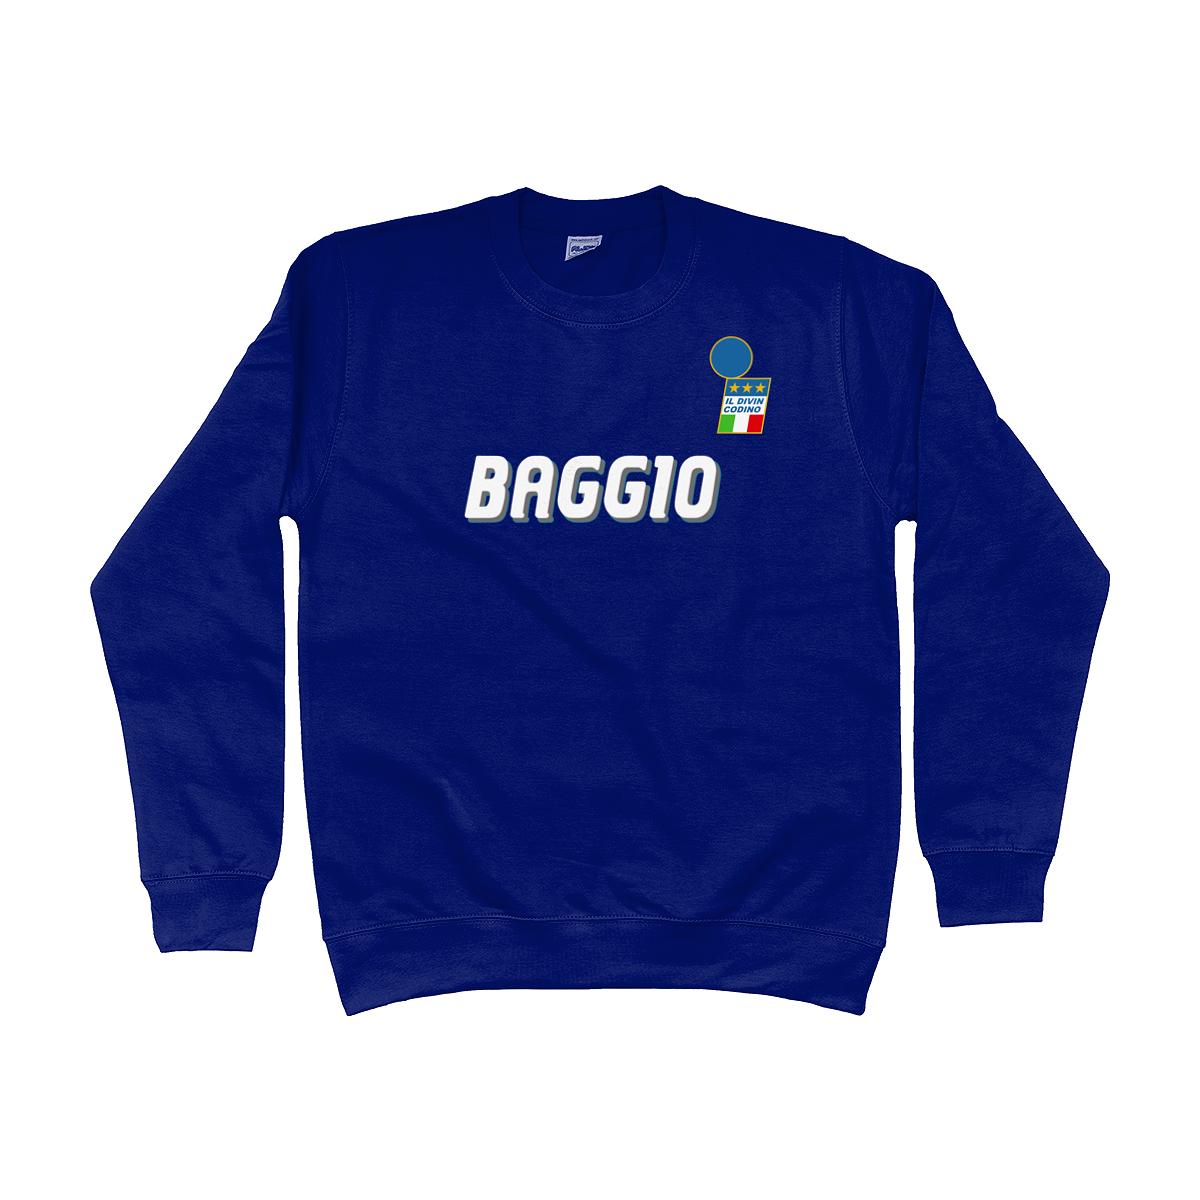 Baggio 1994 Sweatshirt